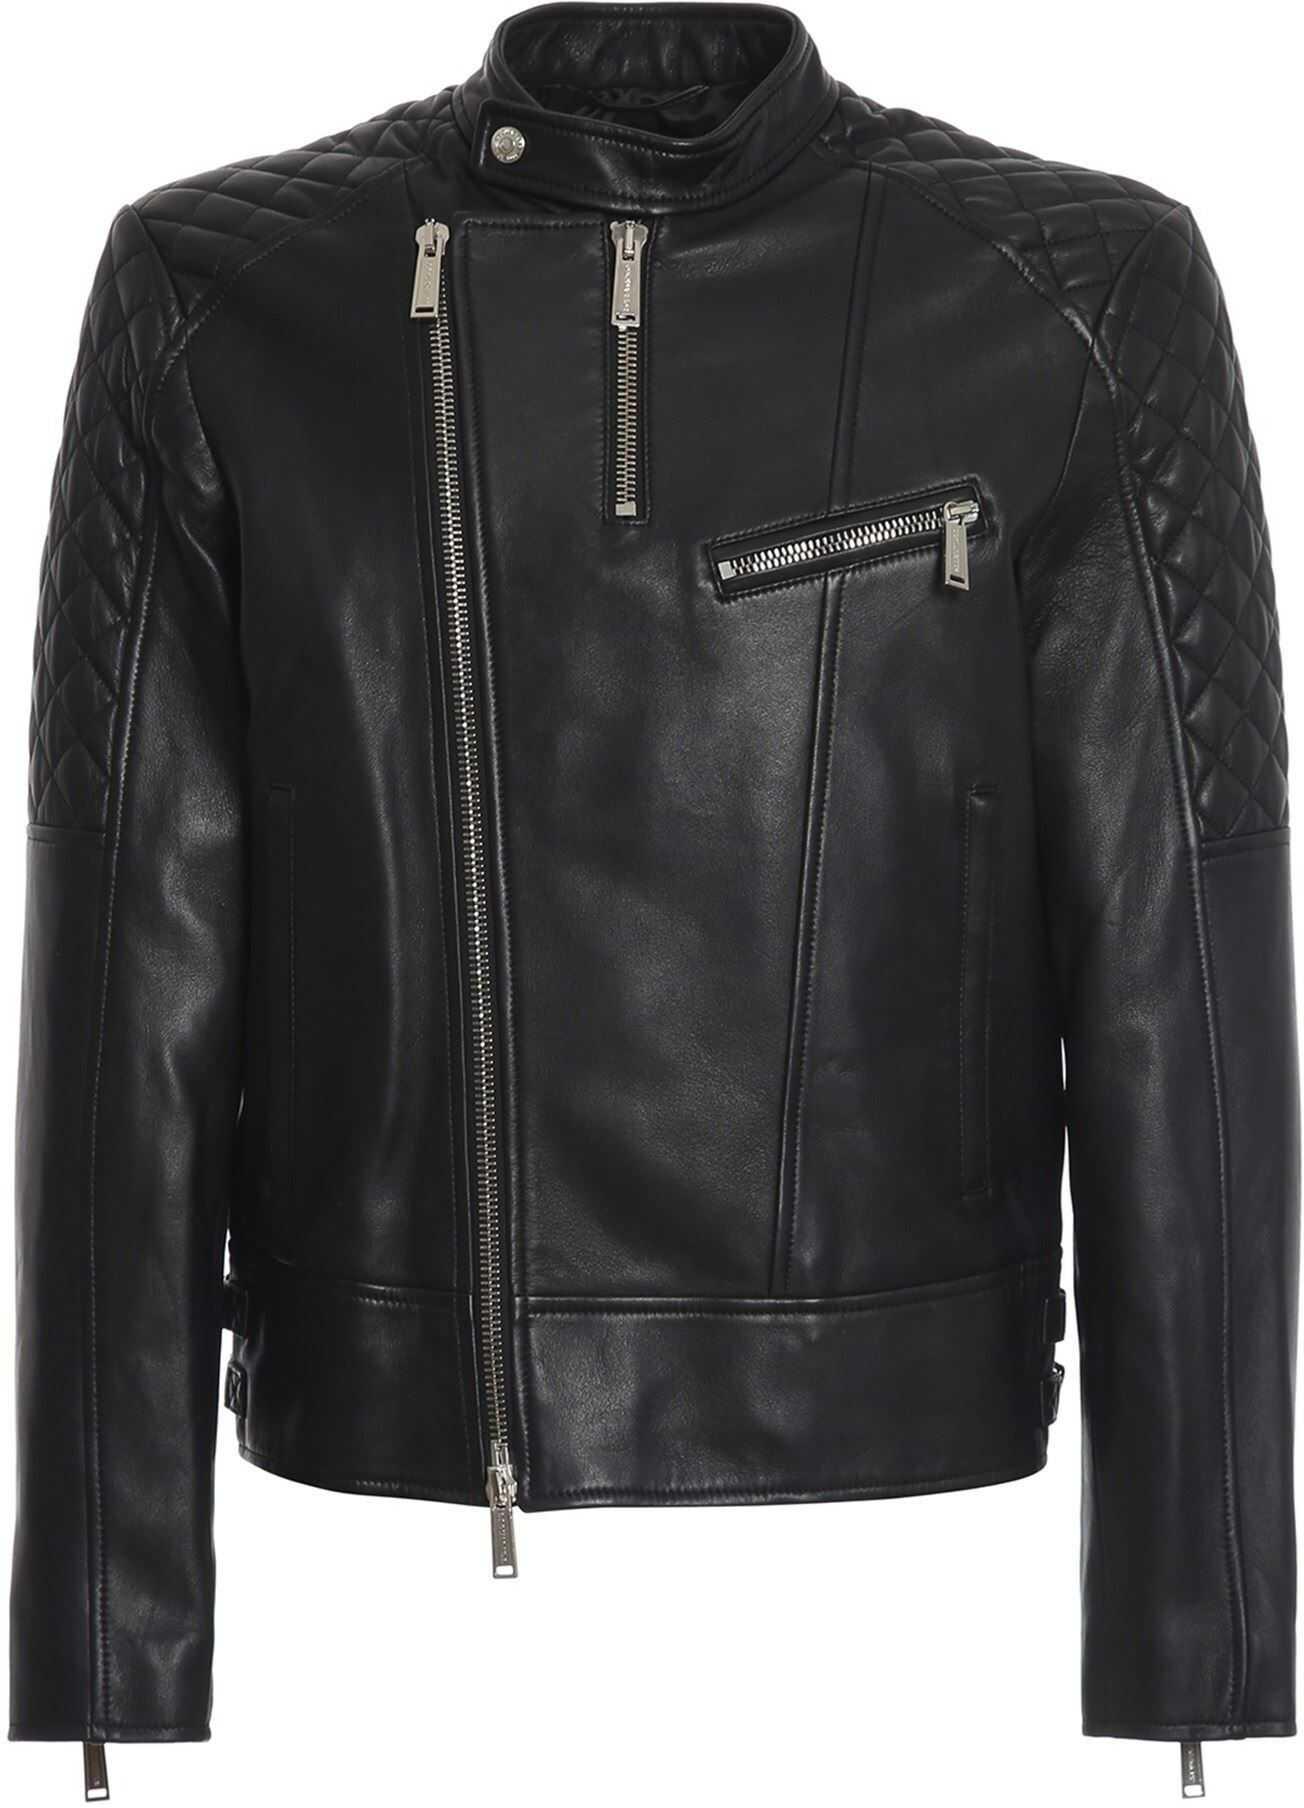 DSQUARED2 Lambskin Biker Jacket In Black Black imagine